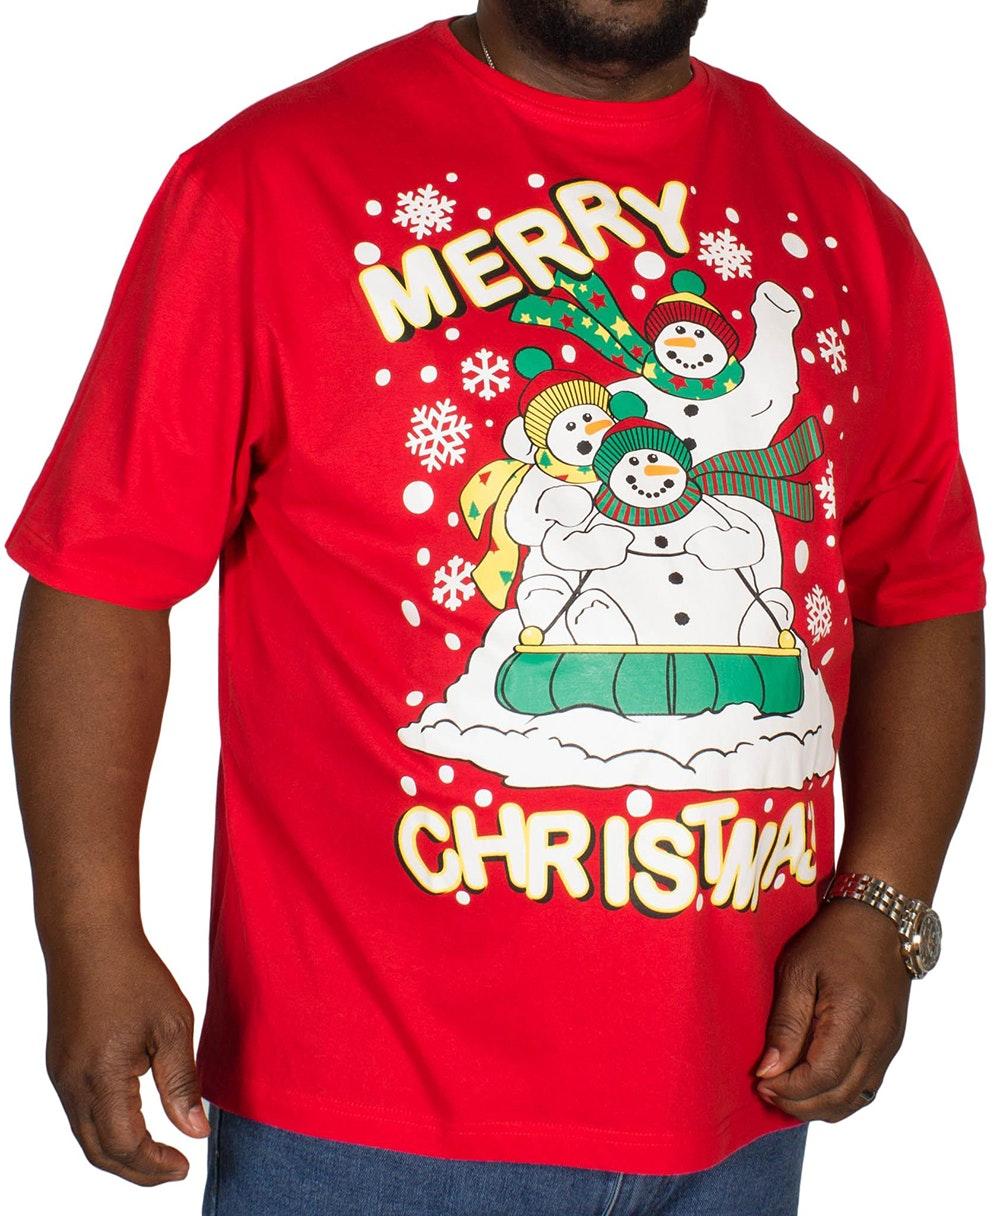 Pierre Roche Merry Christmas Print T-shirt Red